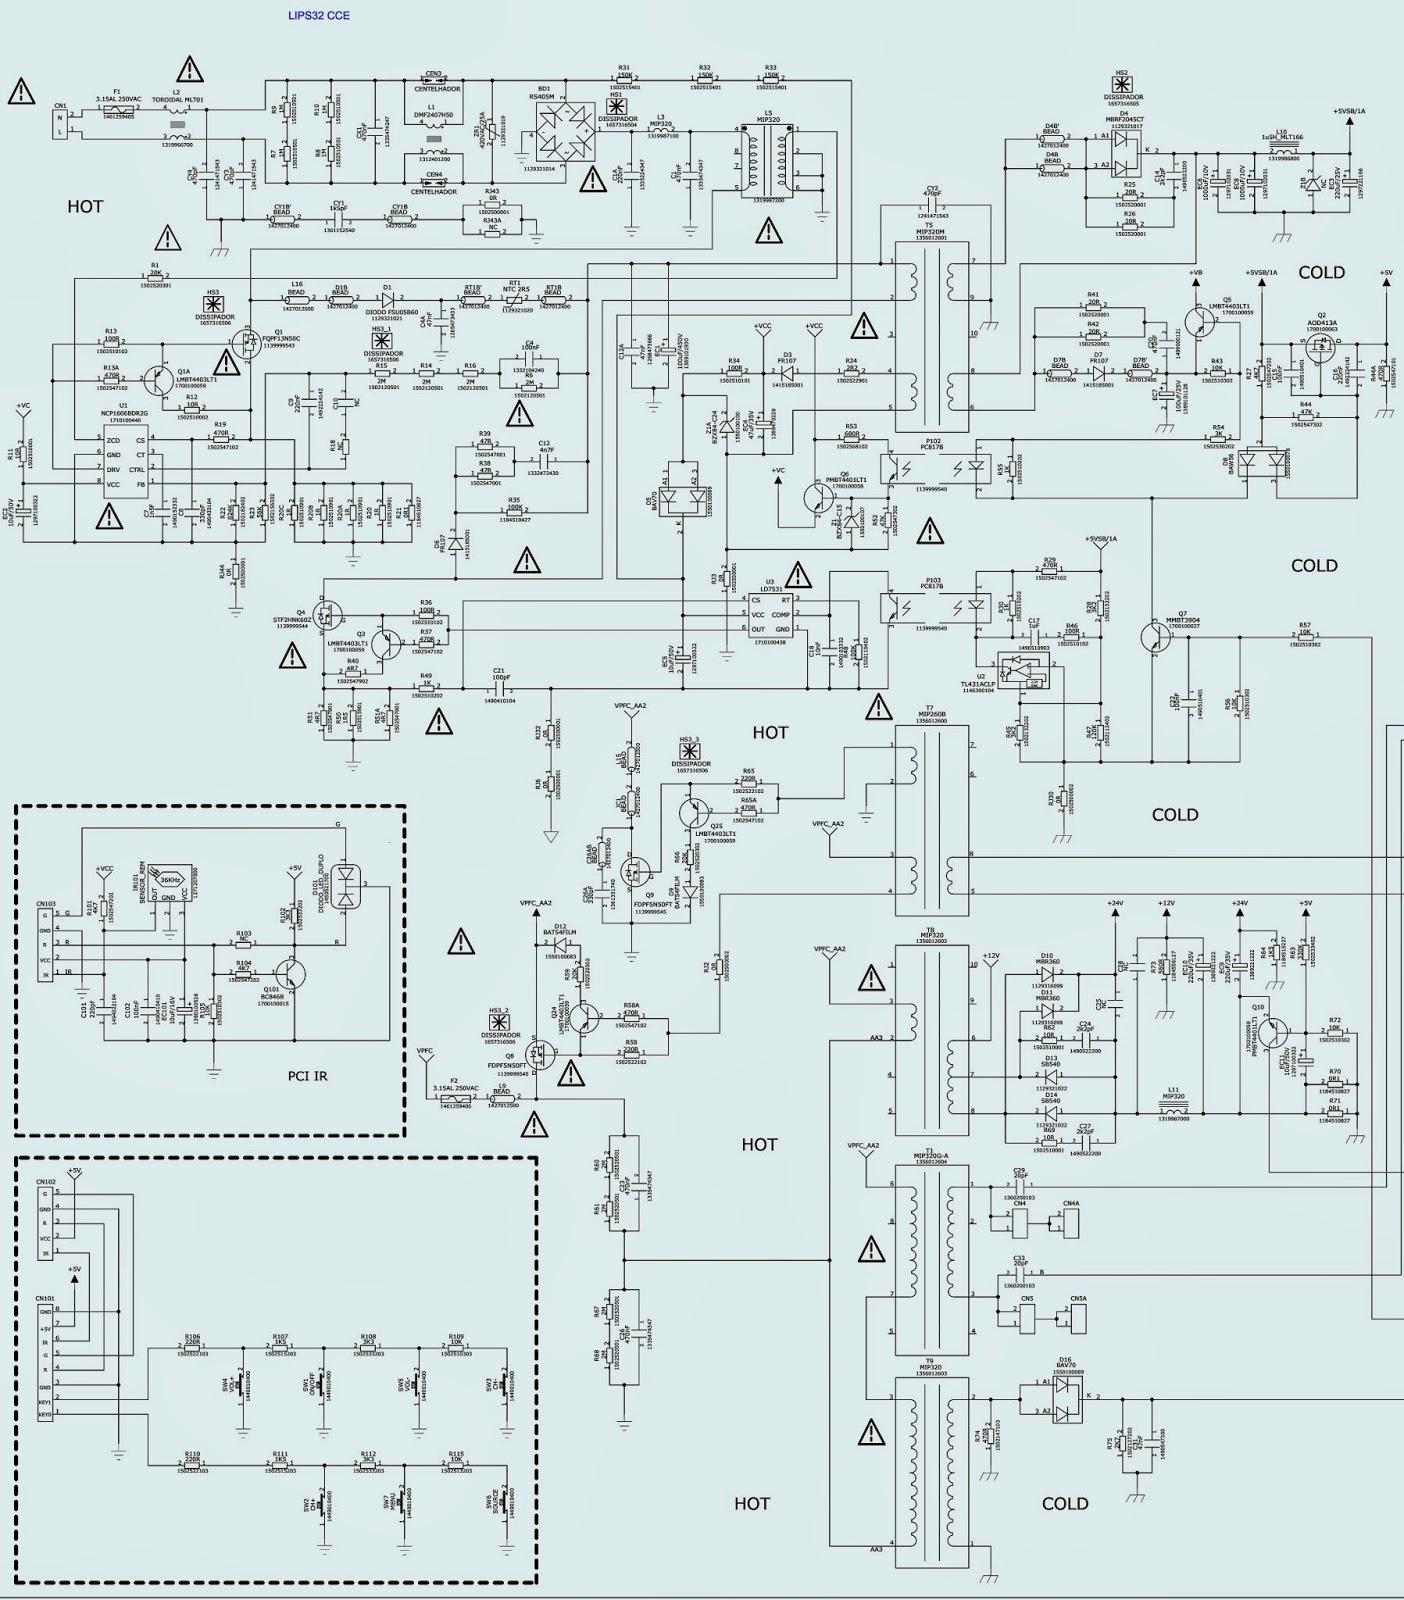 emerson microwave diagram whirlpool microwave diagram